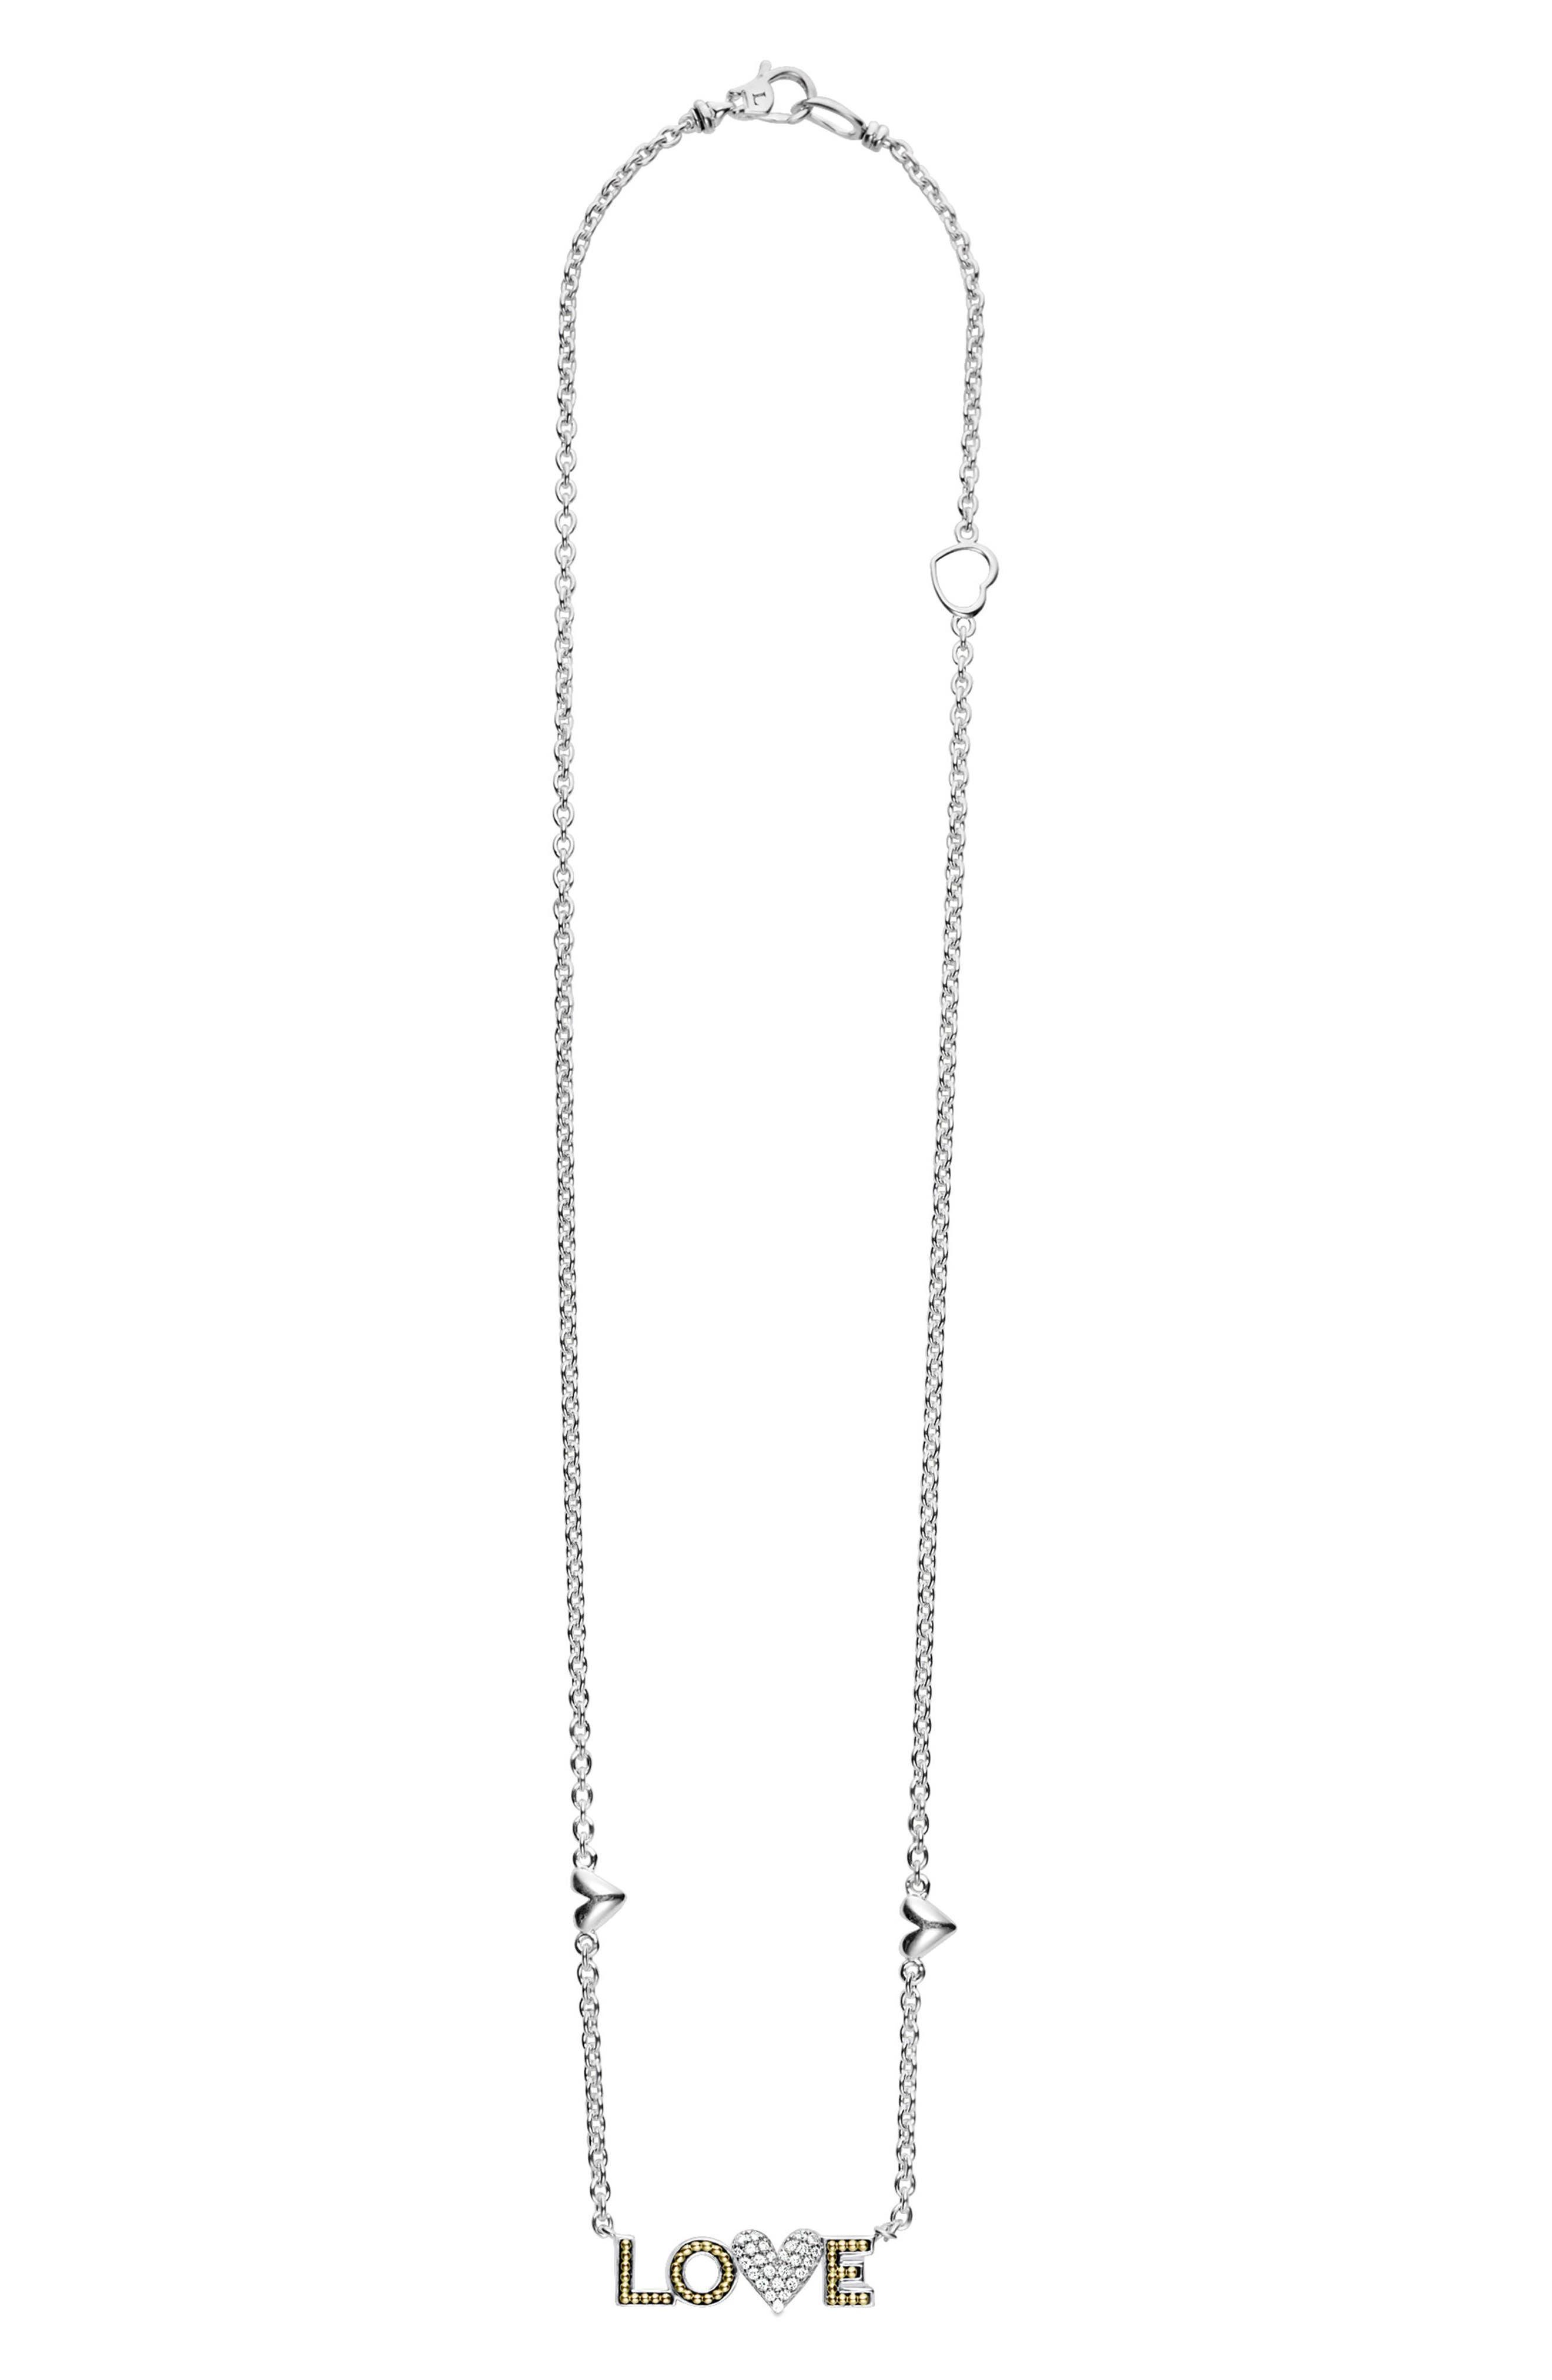 Beloved Diamond Love Pendant Necklace,                             Main thumbnail 1, color,                             Silver/ Diamond